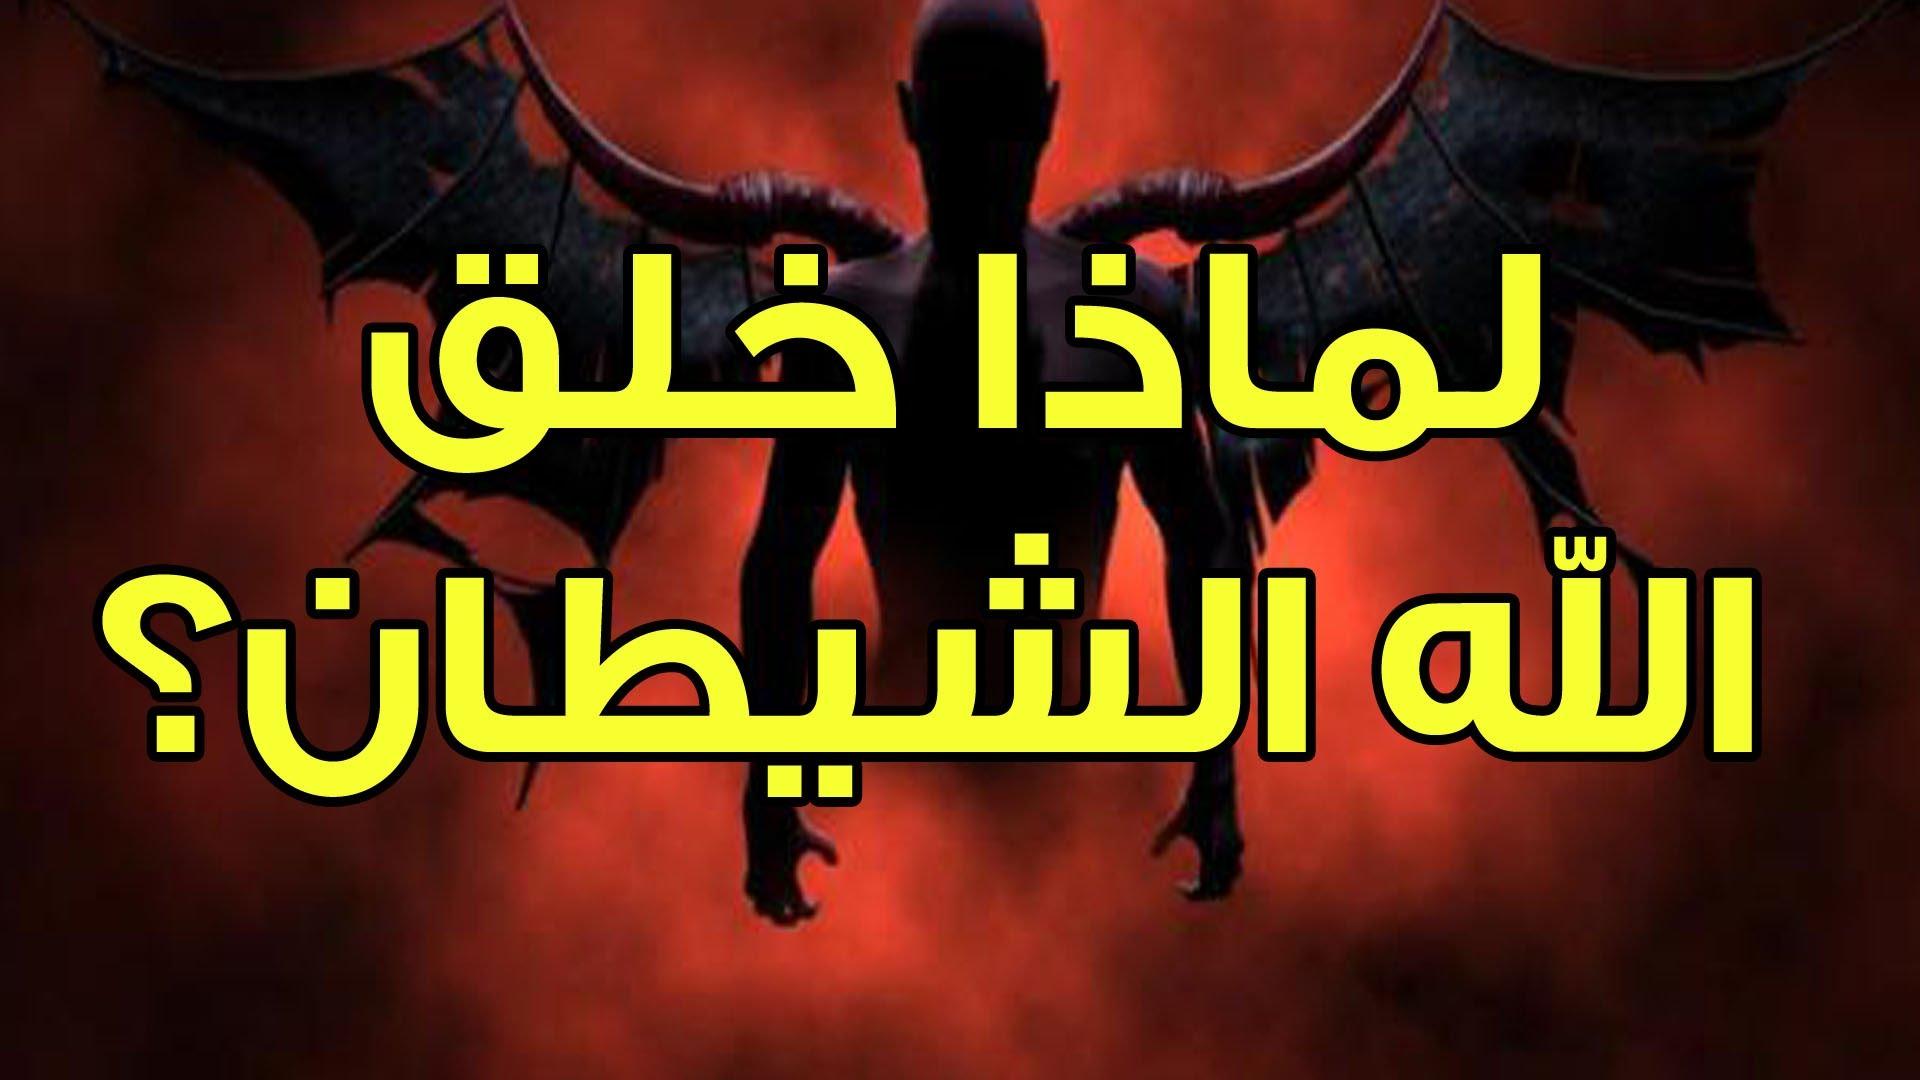 Risultati immagini per لماذا خلق الله الشيطان